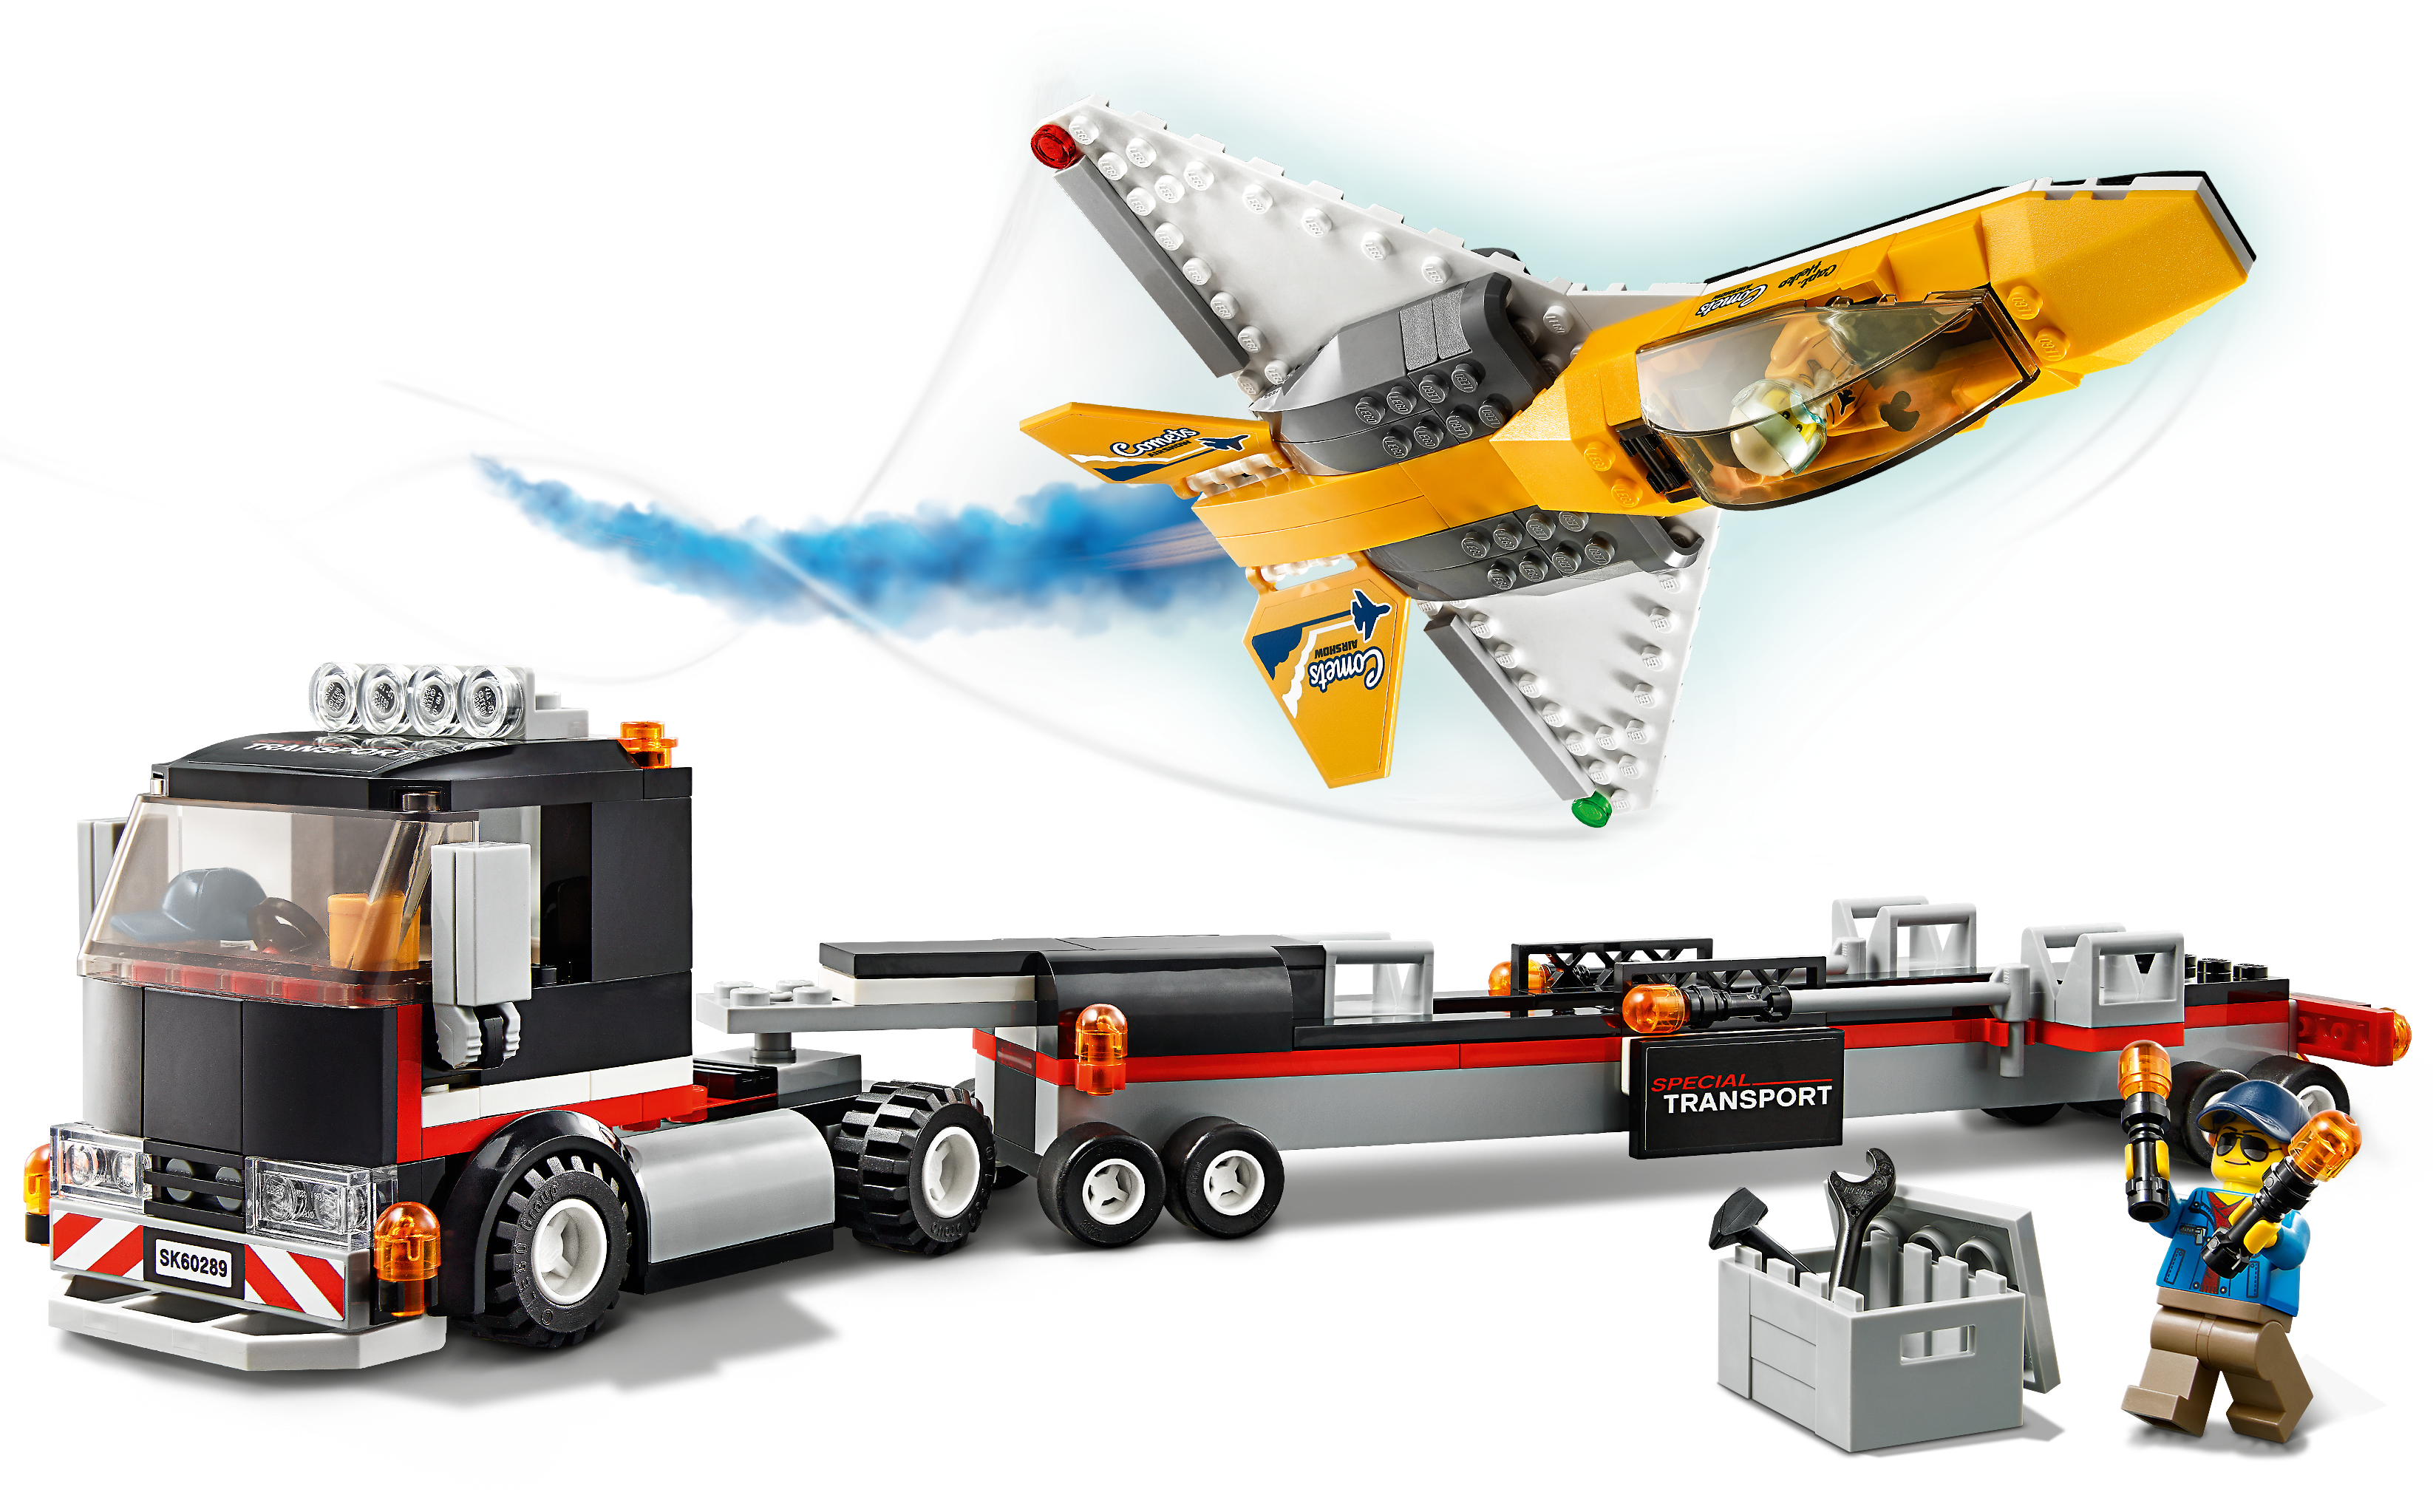 Airshow Jet Transporter